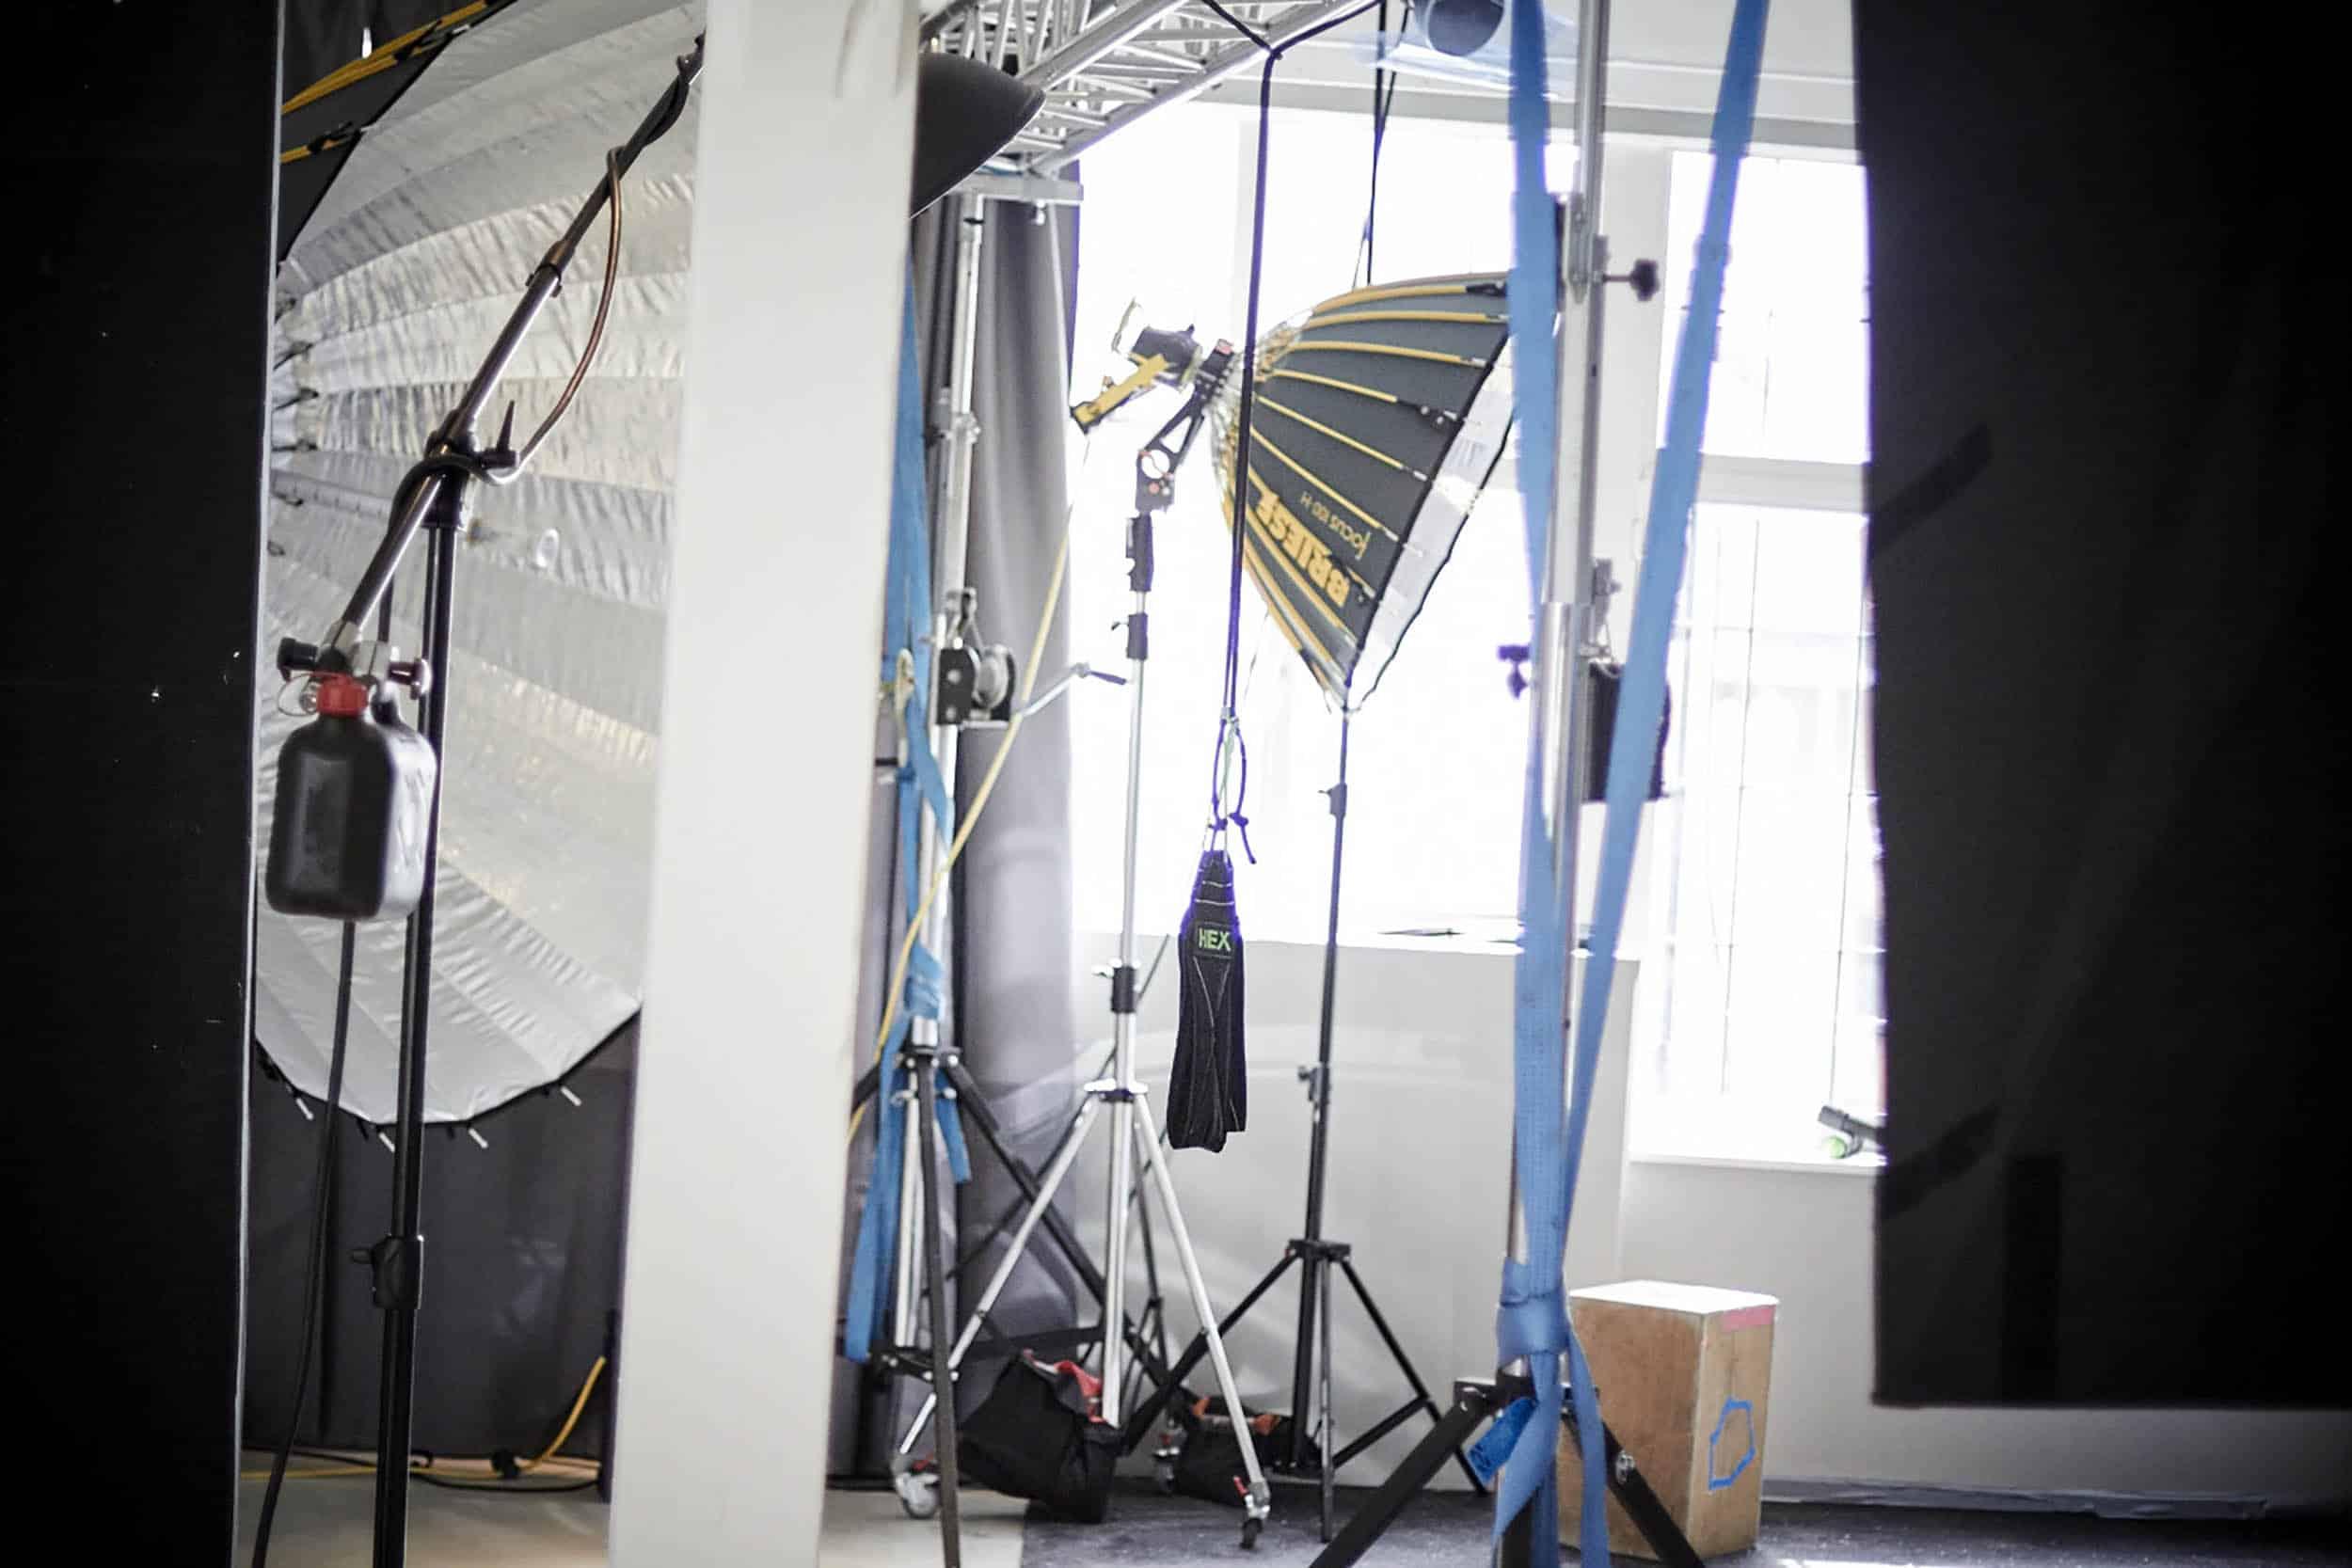 studio-ignatov-klitschko-warsteiner-imagekampagne-makingof-04